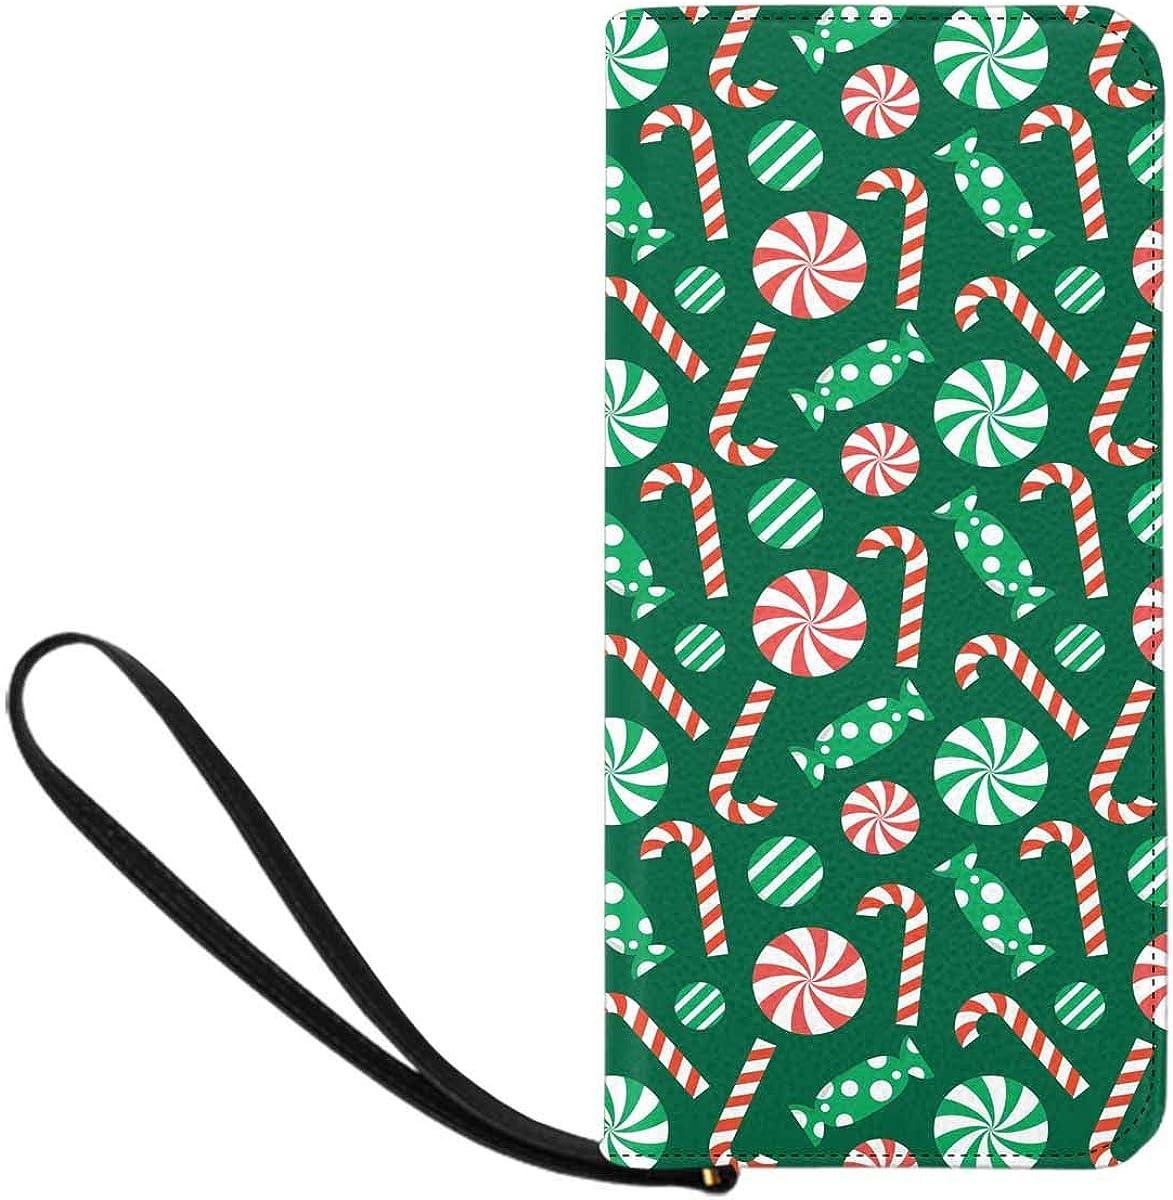 INTERESTPRINT Christmas Pattern Wristlet Wallet for Women with Wrist Strap